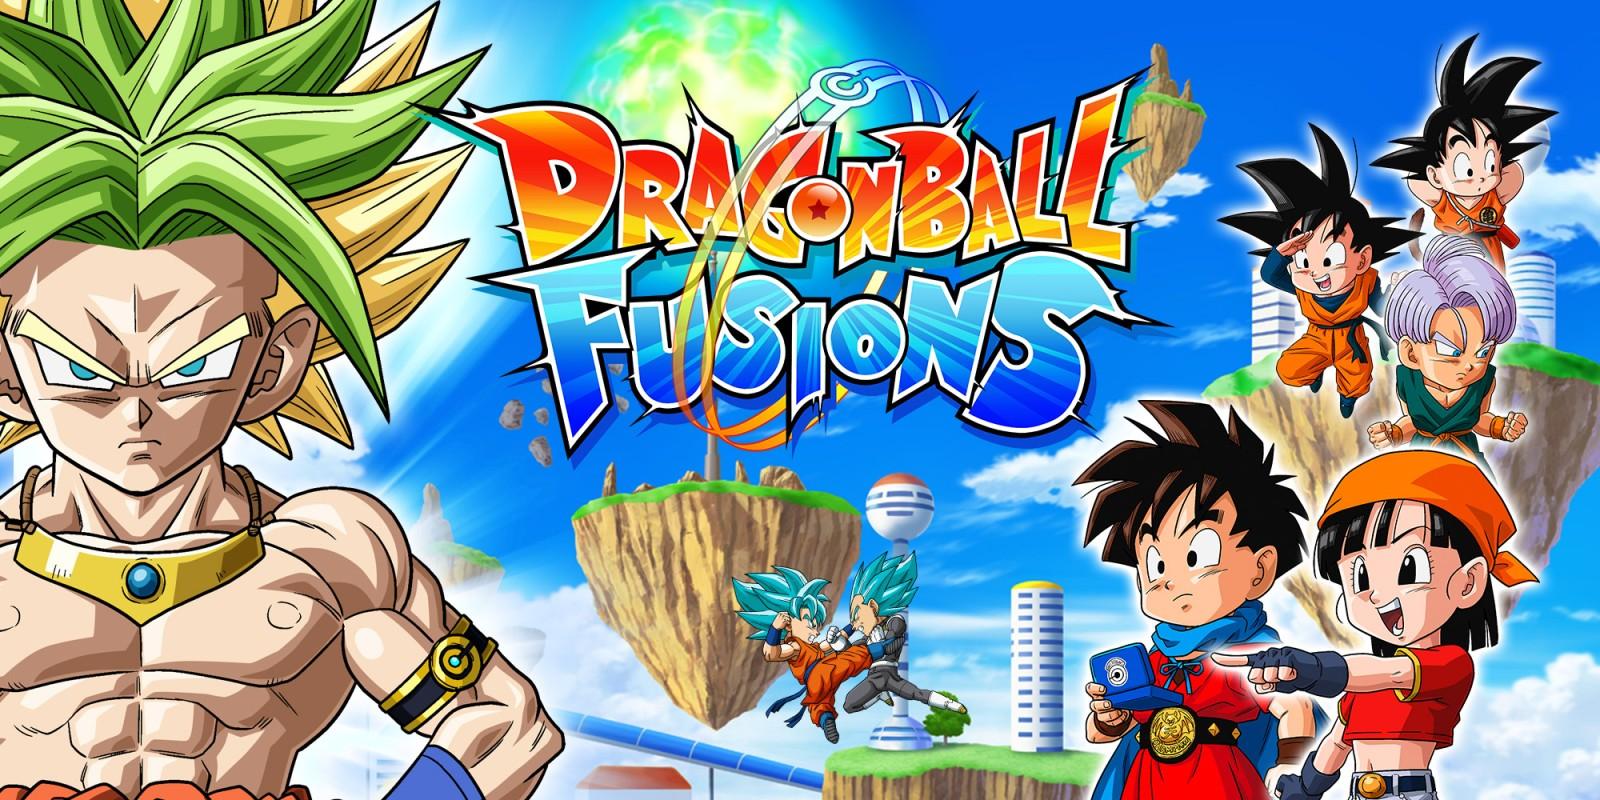 Ps4 Games Hd Wallpapers Dragon Ball Fusions Nintendo 3ds Juegos Nintendo